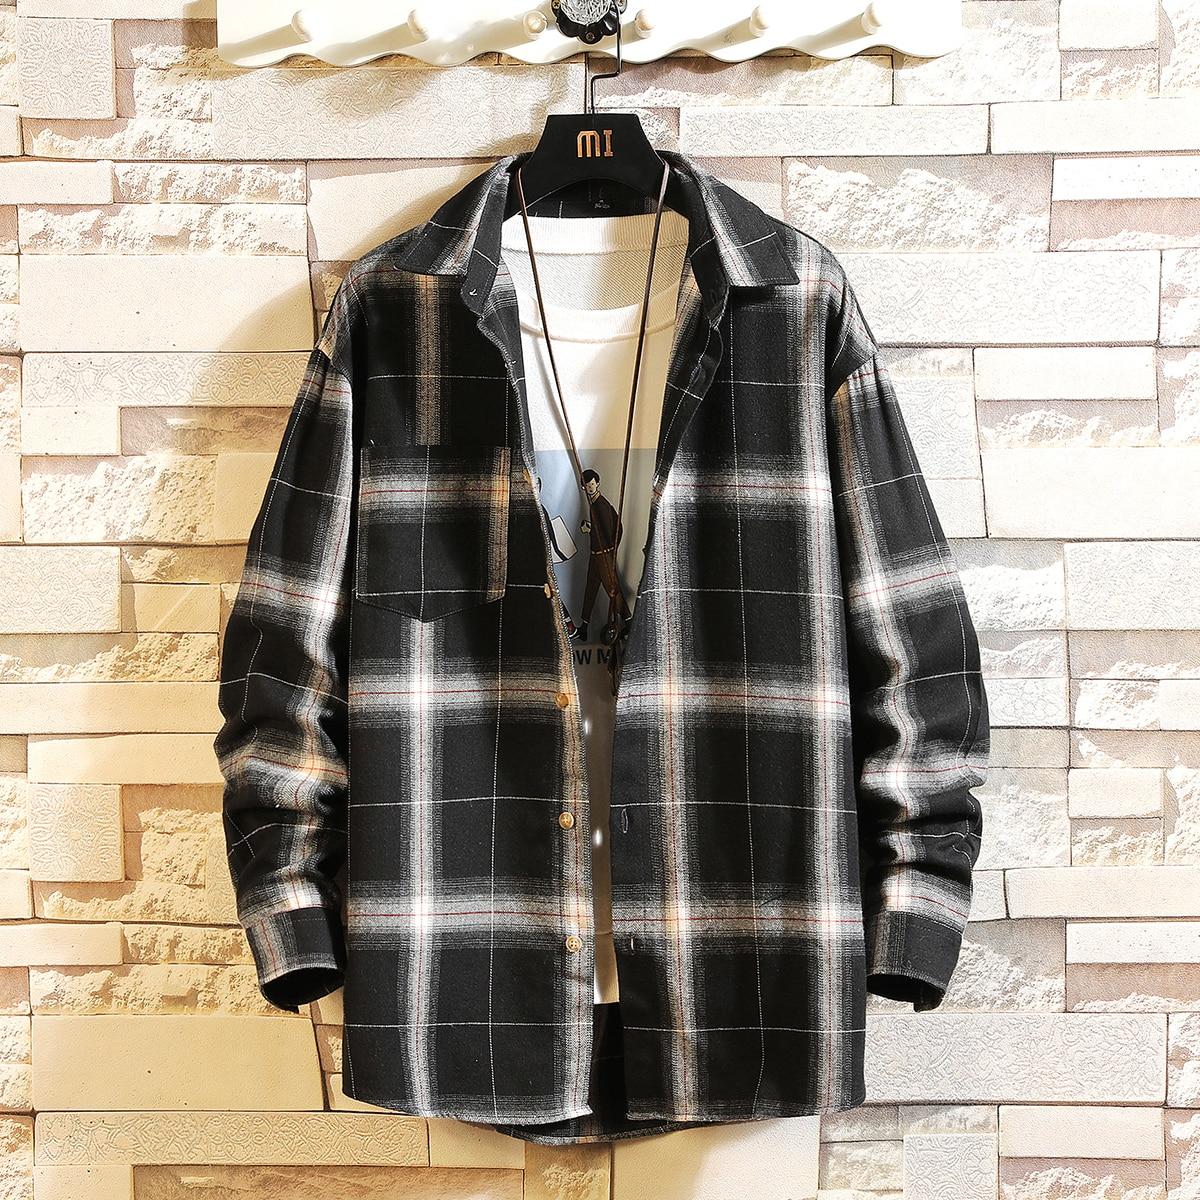 HIP HOP Streetwear Casual Oversize Plaid Flannel White Black Shirt Men Long Sleeve 2020 Loose Spring Autumn Korea Clothes